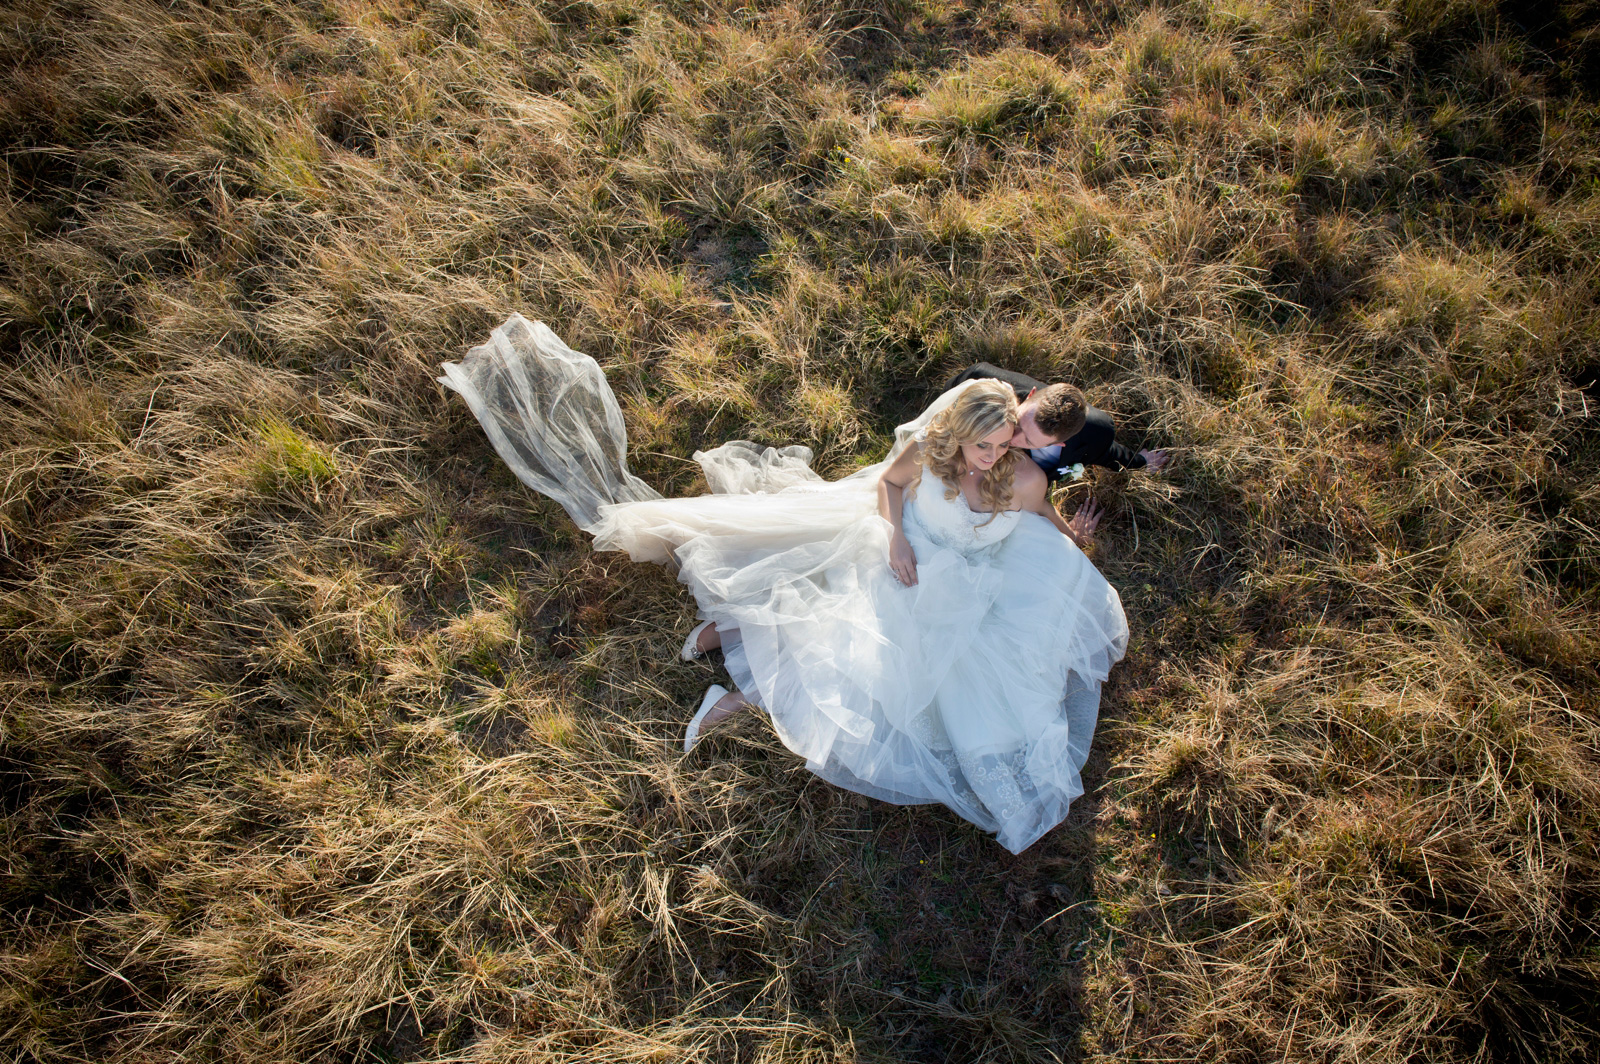 Netherwood-Winter-Wedding-Creative-KZN-Wedding-Photographer-Jacki-Bruniquel-001